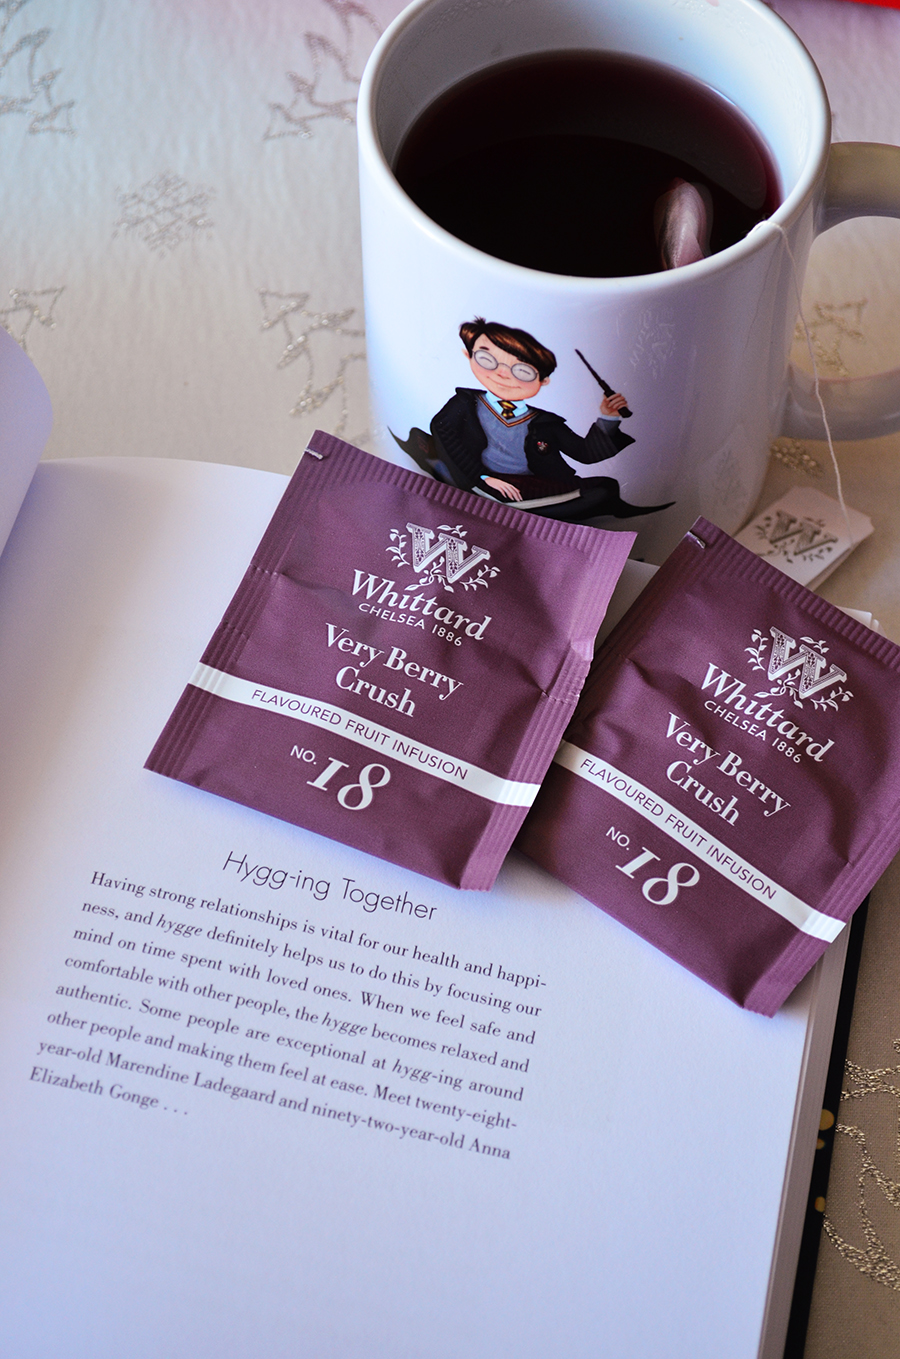 ceai whittard very bery crush carte hygge